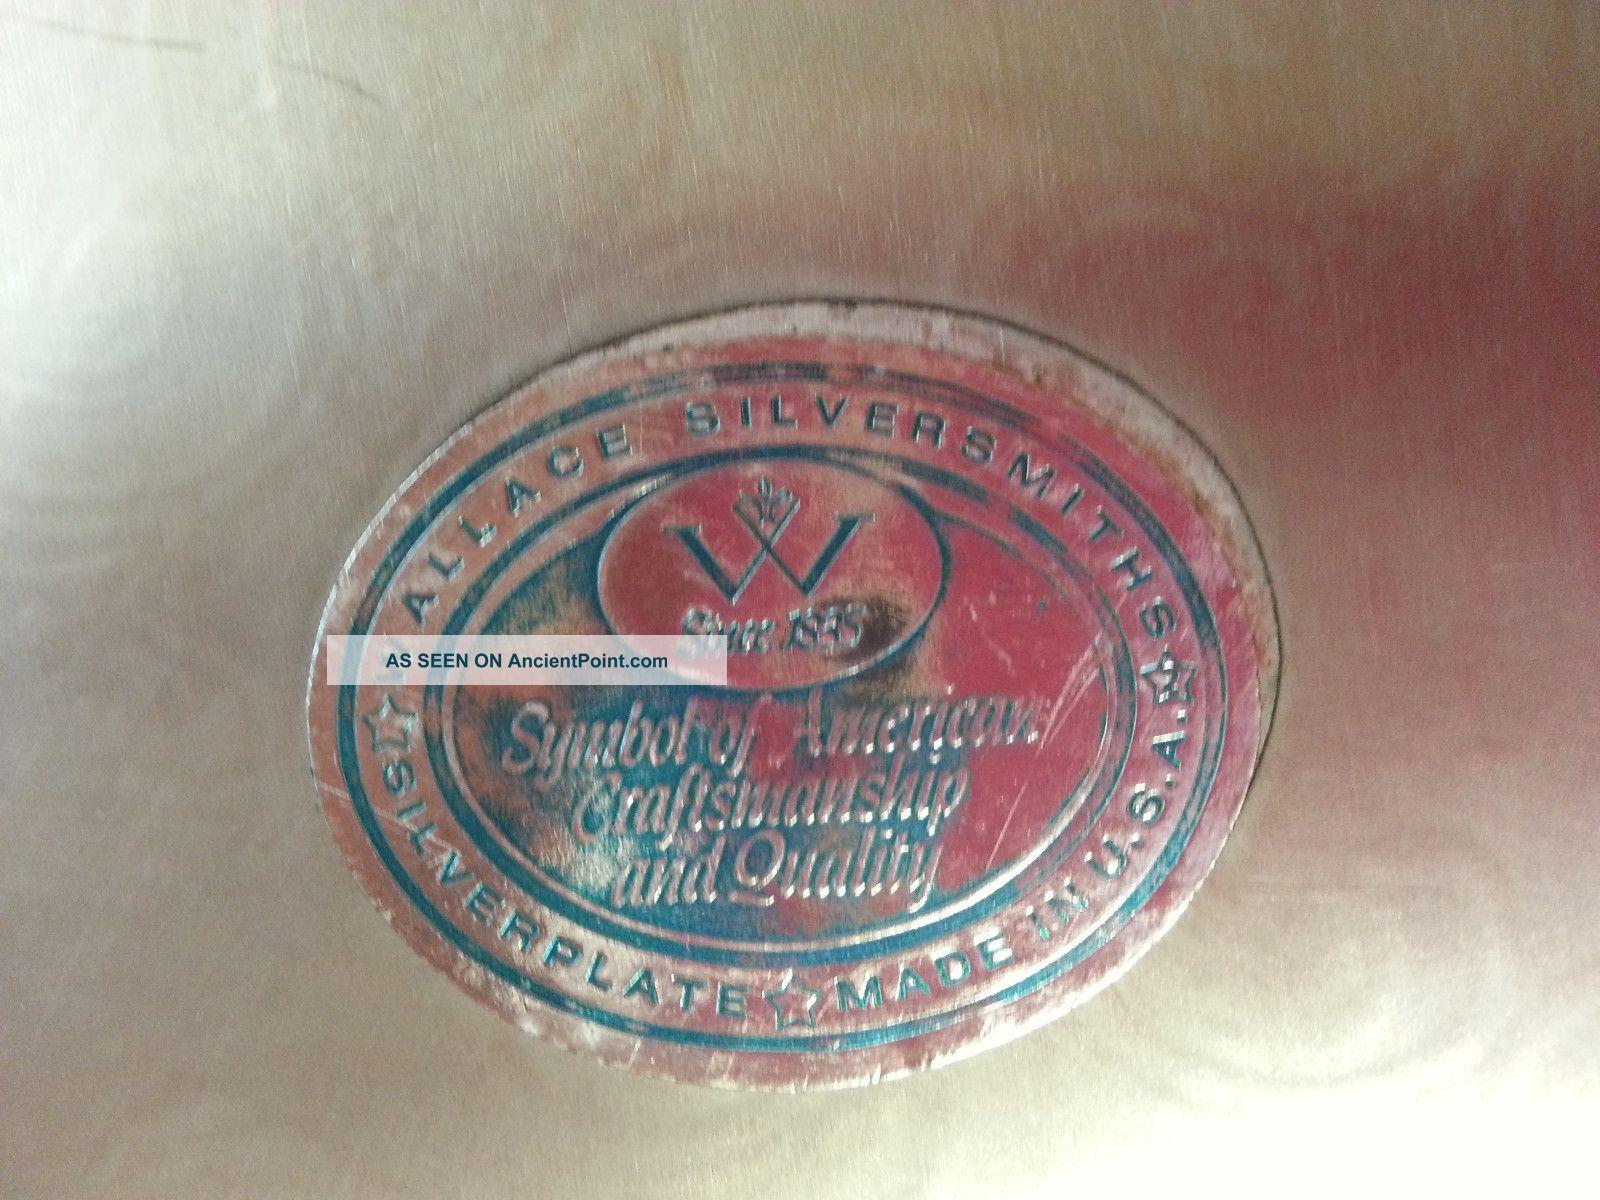 Wallace silversmith silver platter w since 1935 symbol of american wallace silversmith silver platter w since 1935 symbol of american craftsmanship biocorpaavc Choice Image